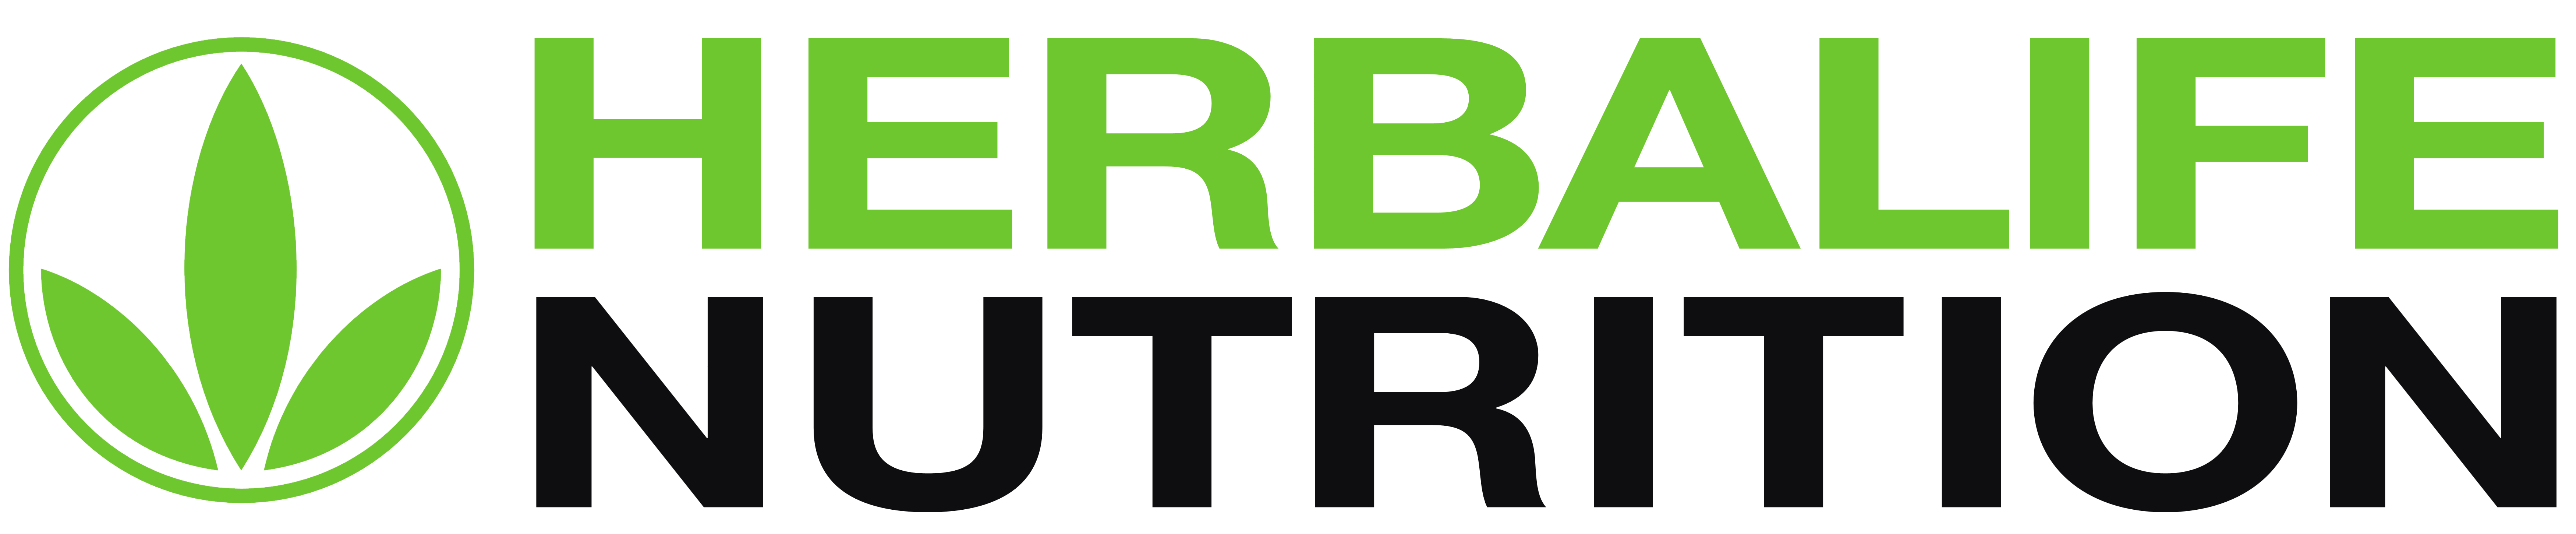 Herbalife – Logos, brands and logotypes - Herbalife Logo Clip Art